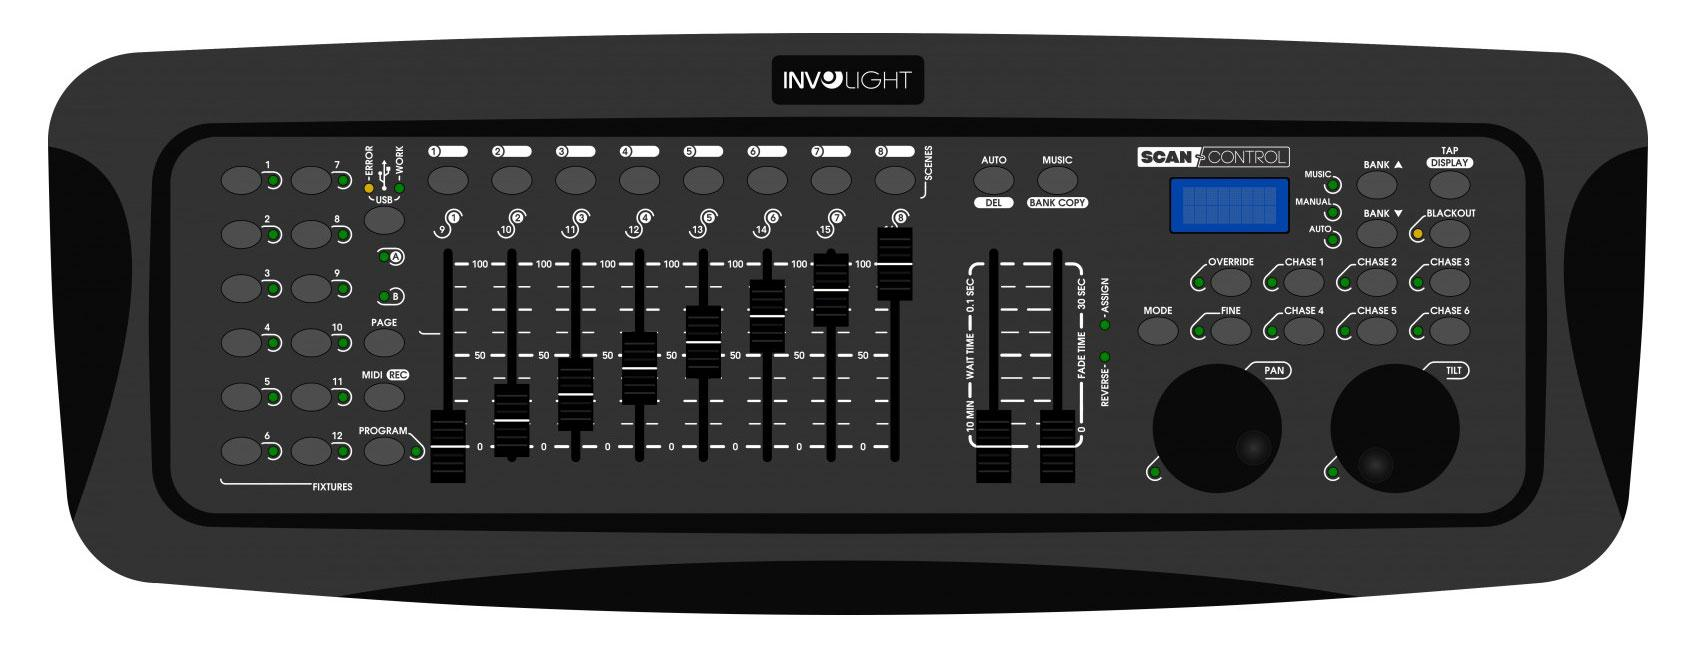 Involivht ScanControl DMX 512 Controller